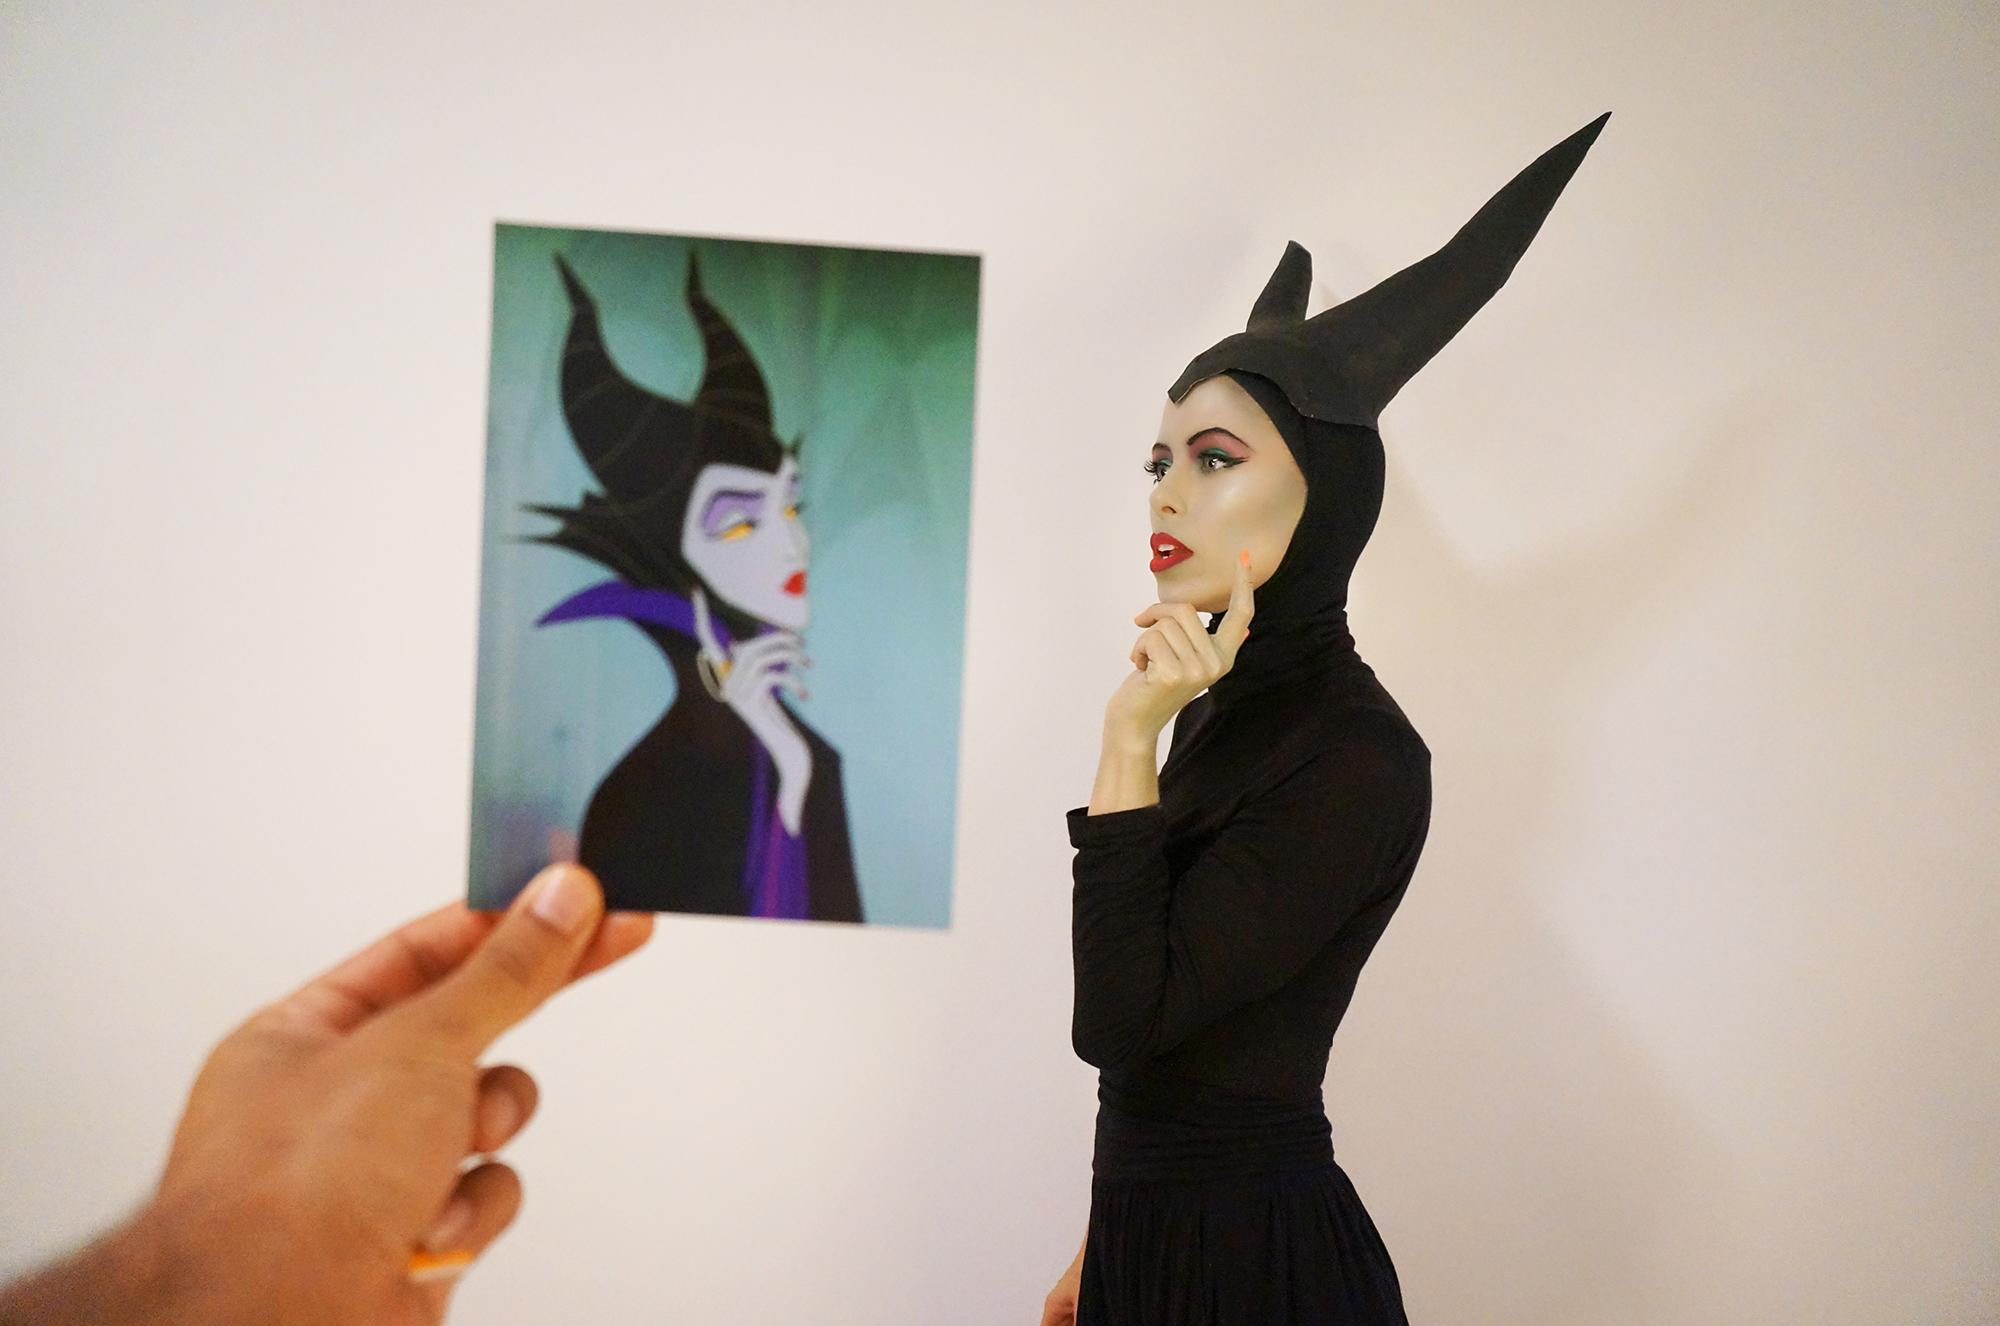 The Original Maleficent